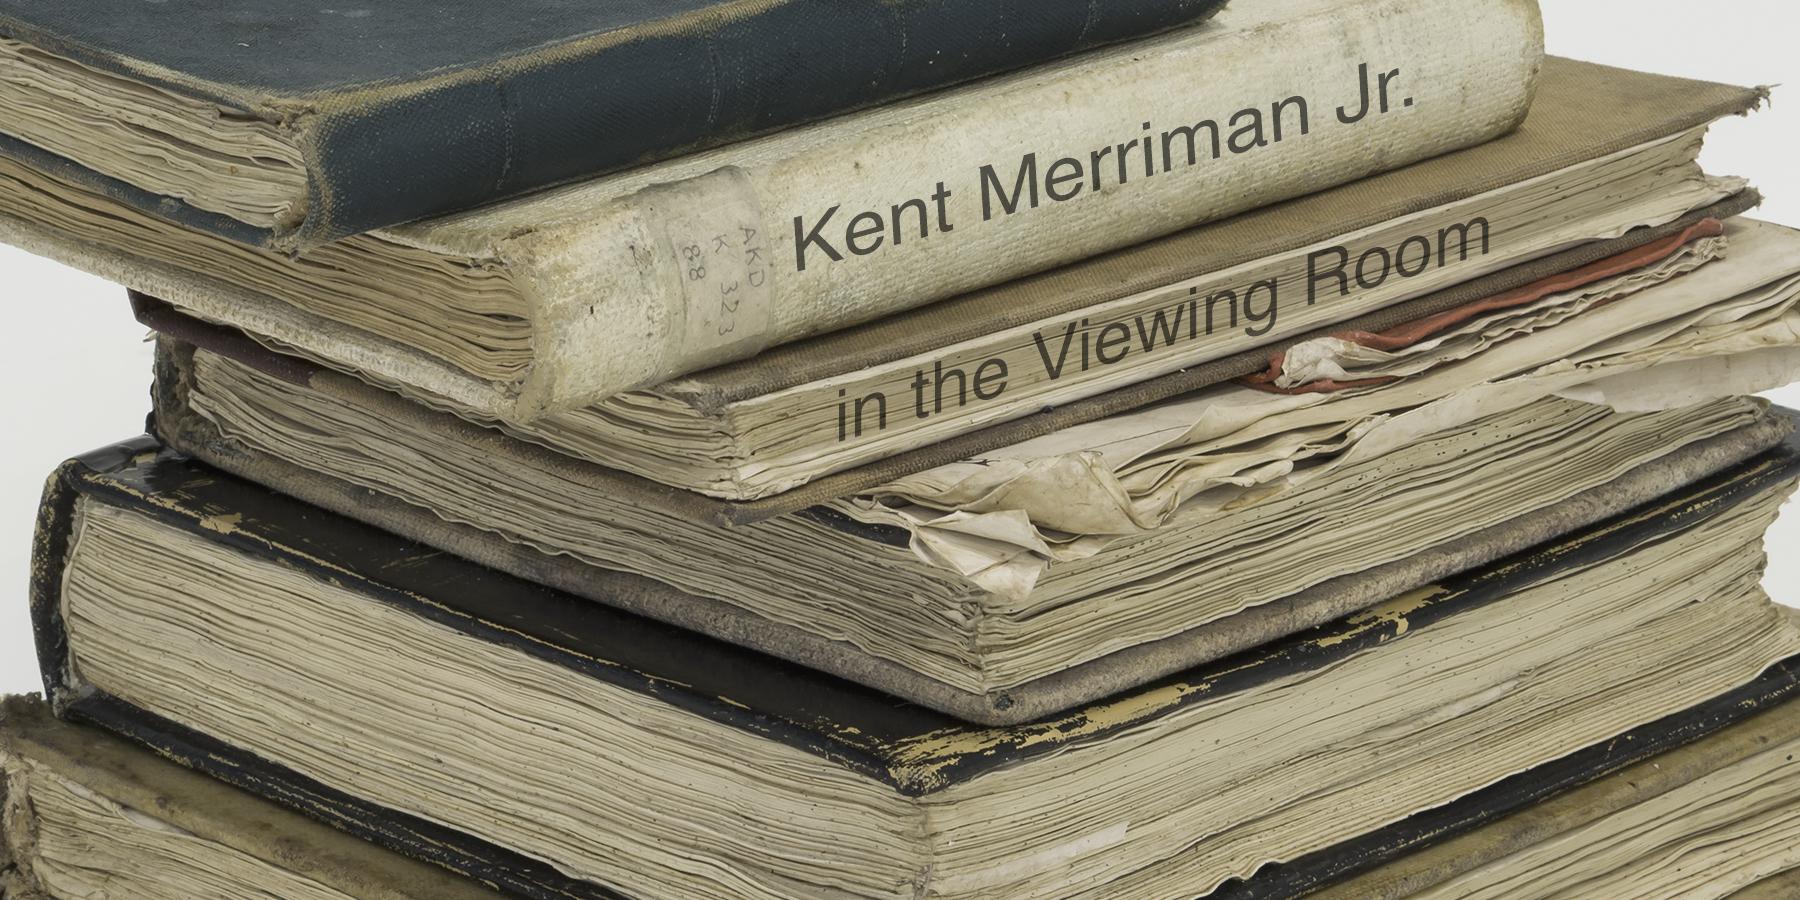 Kent Merriman Jr : New and Recent Work in the Viewing Room